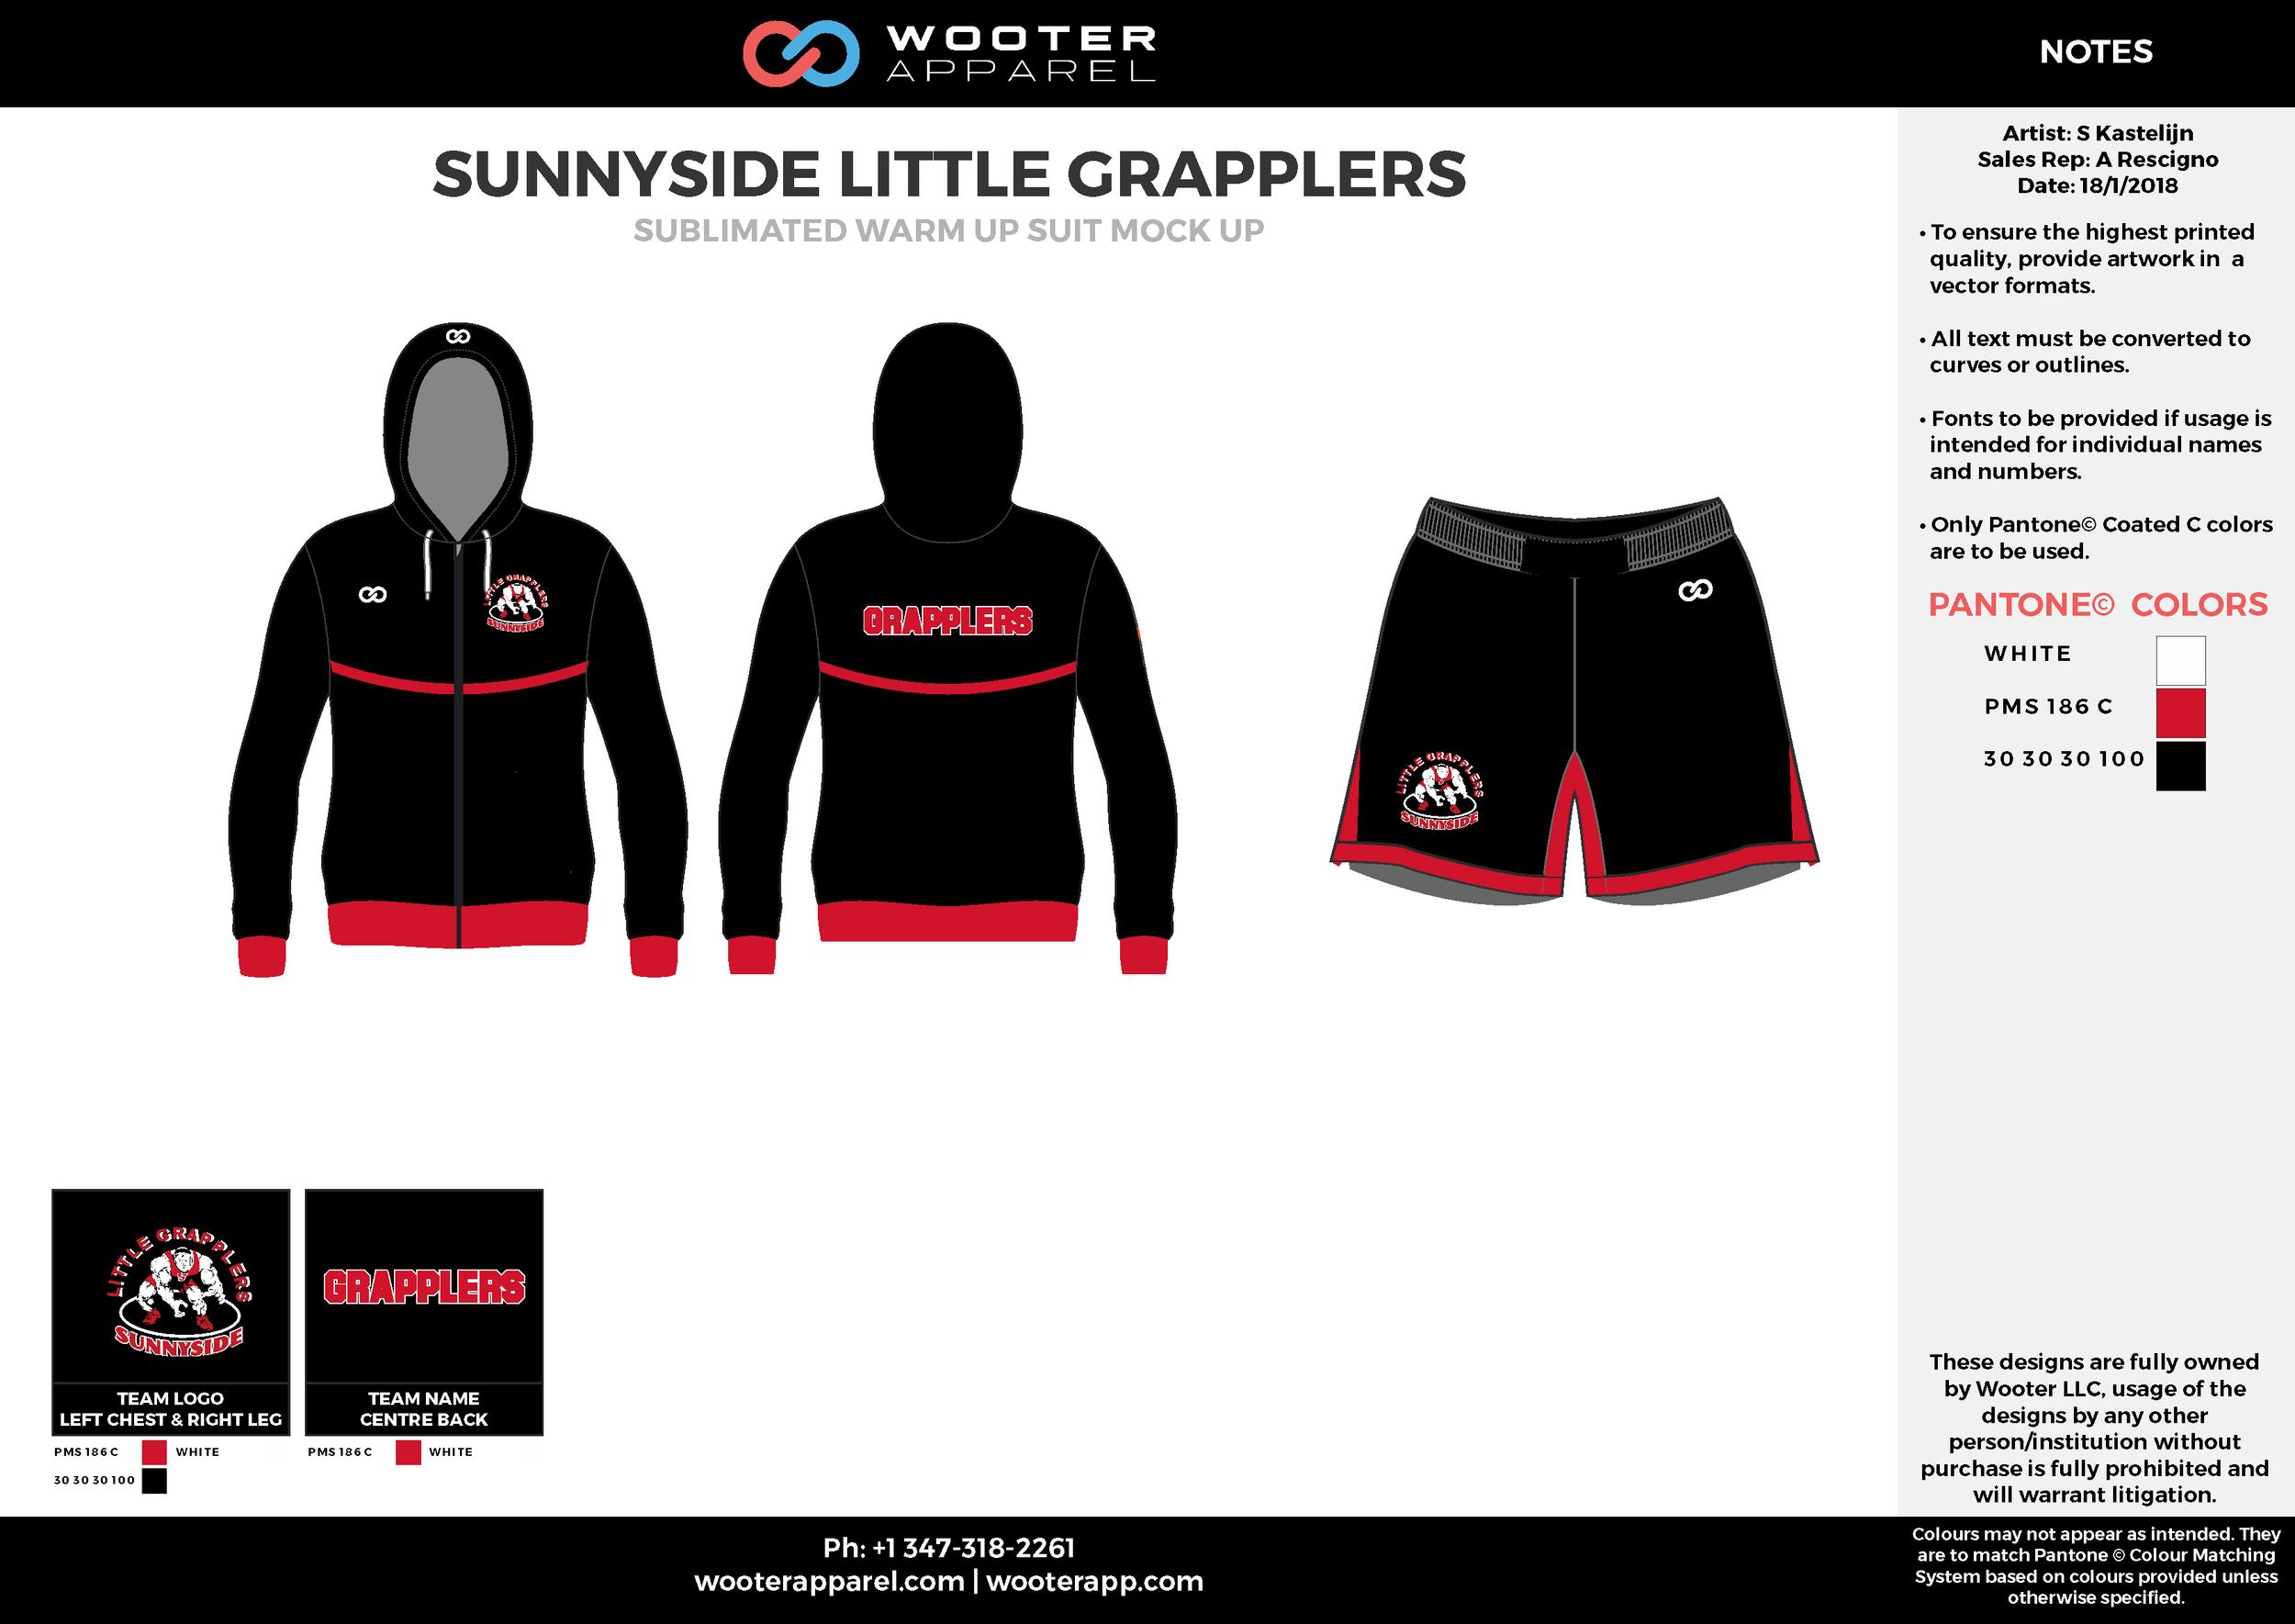 SUNNYSIDE LITTLE GRAPPLERS White Black Red Sublimated Wrestling Uniform, Hoodie Jacket, Shorts